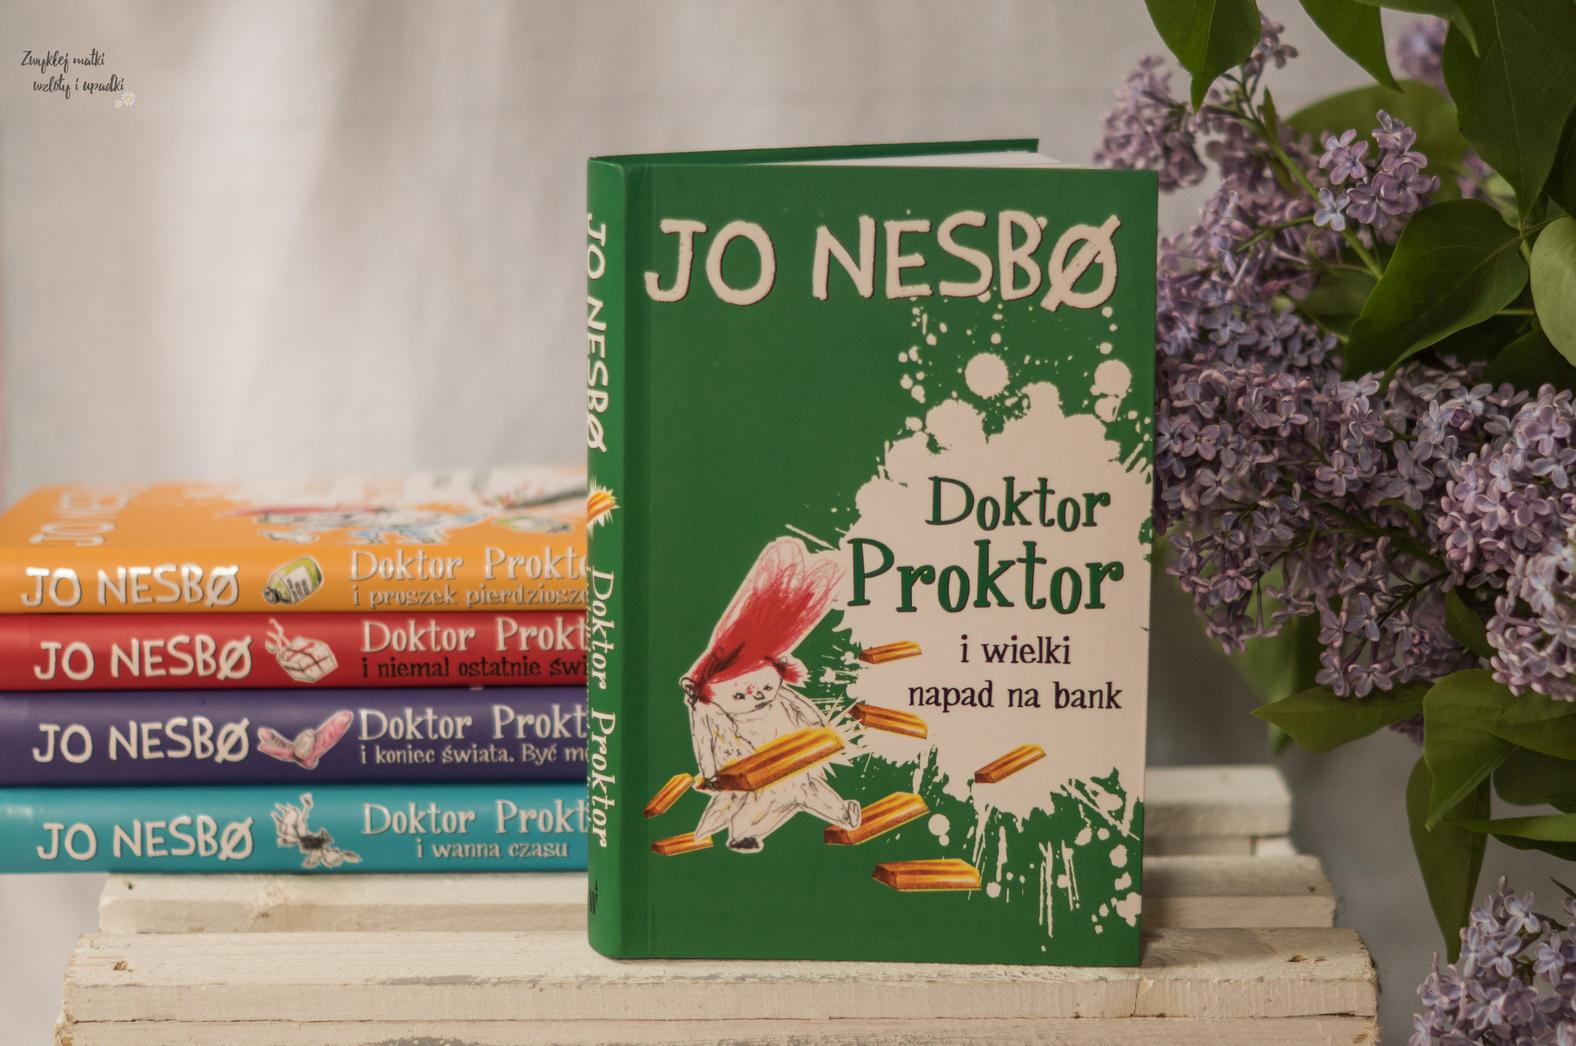 Doktor Proktor - szalony naukowiec Jo Nesbo